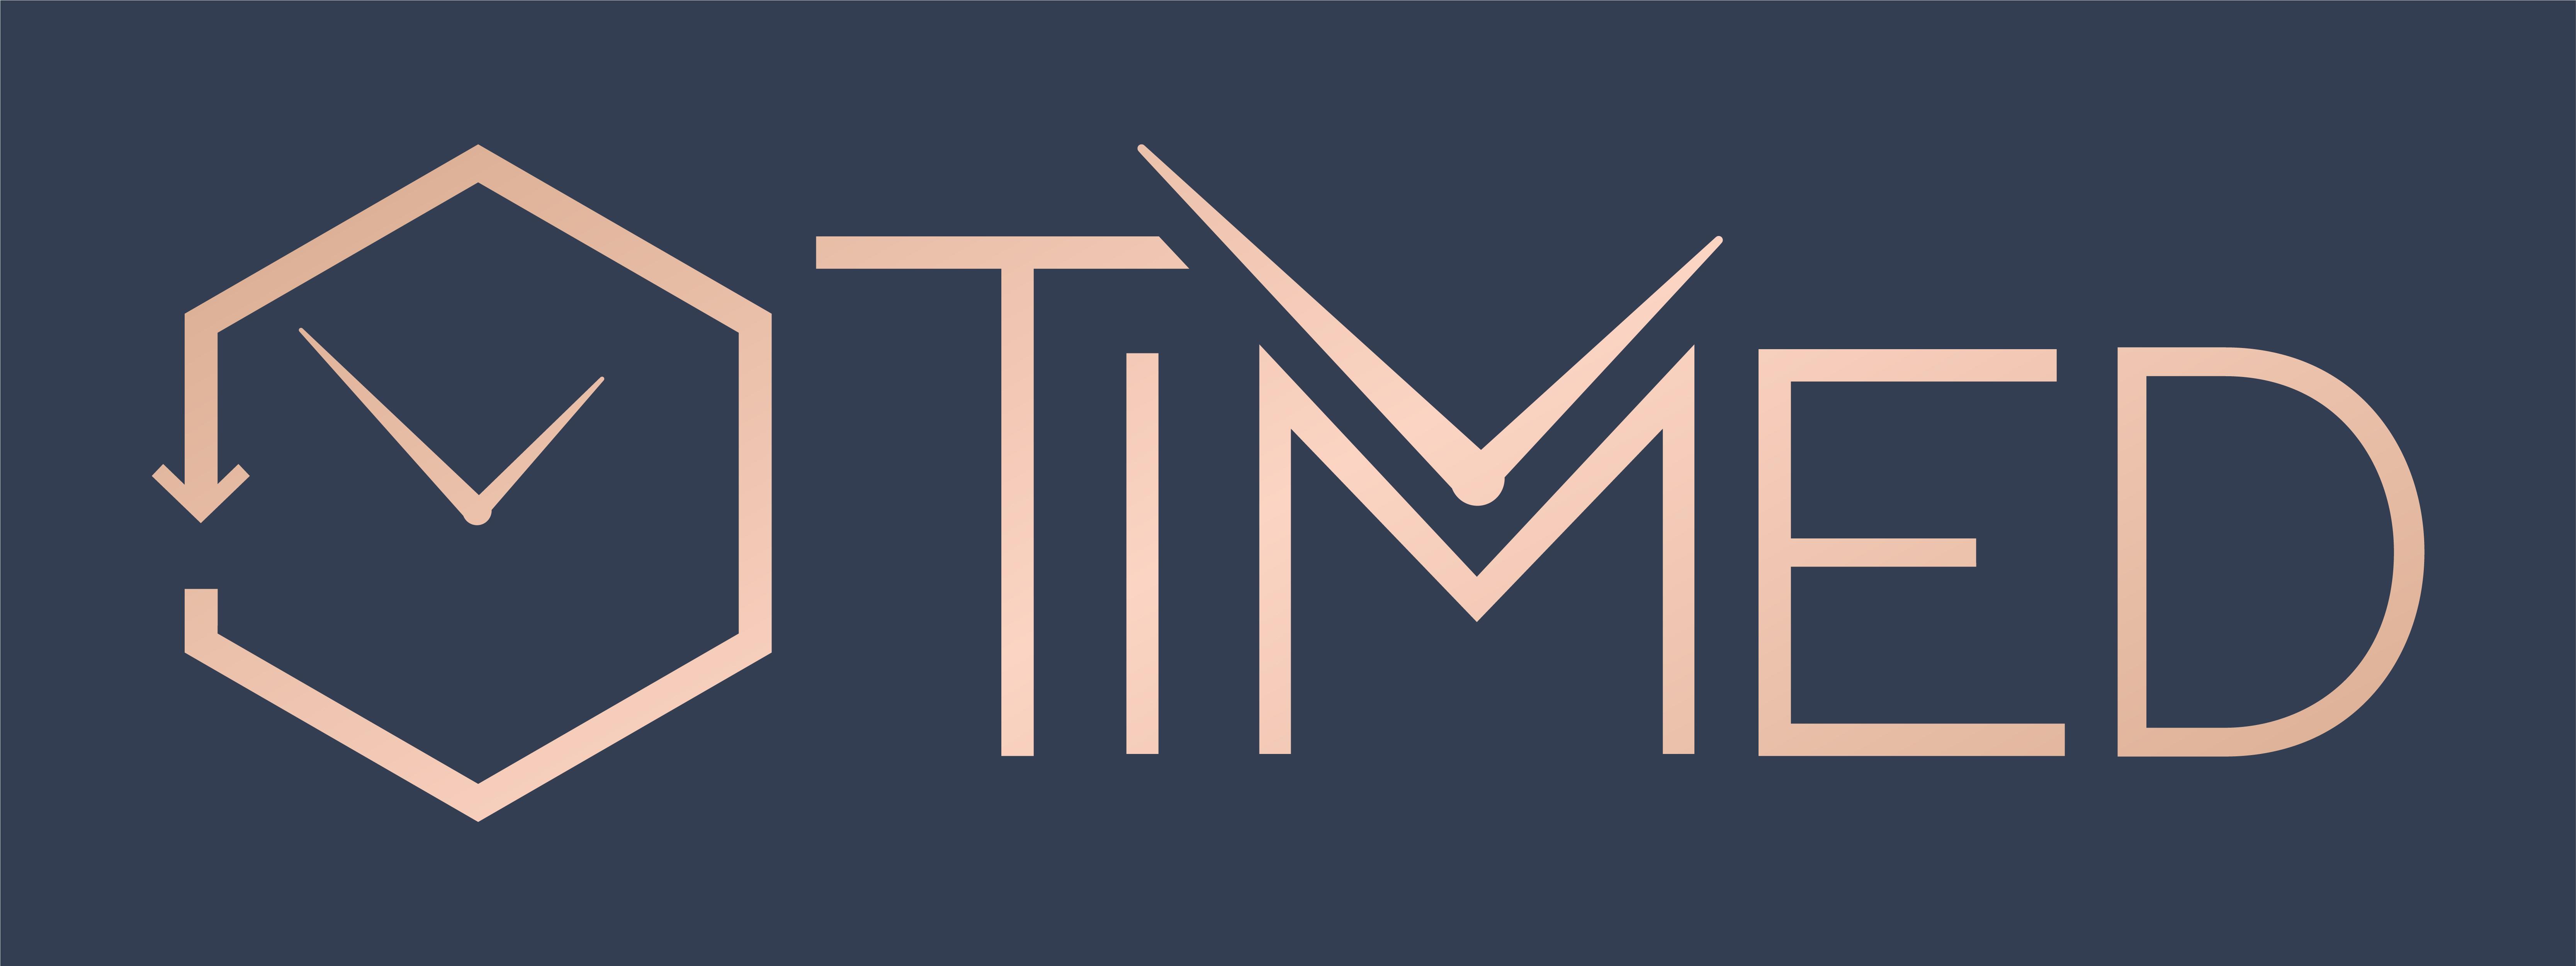 TIMED - TIMED